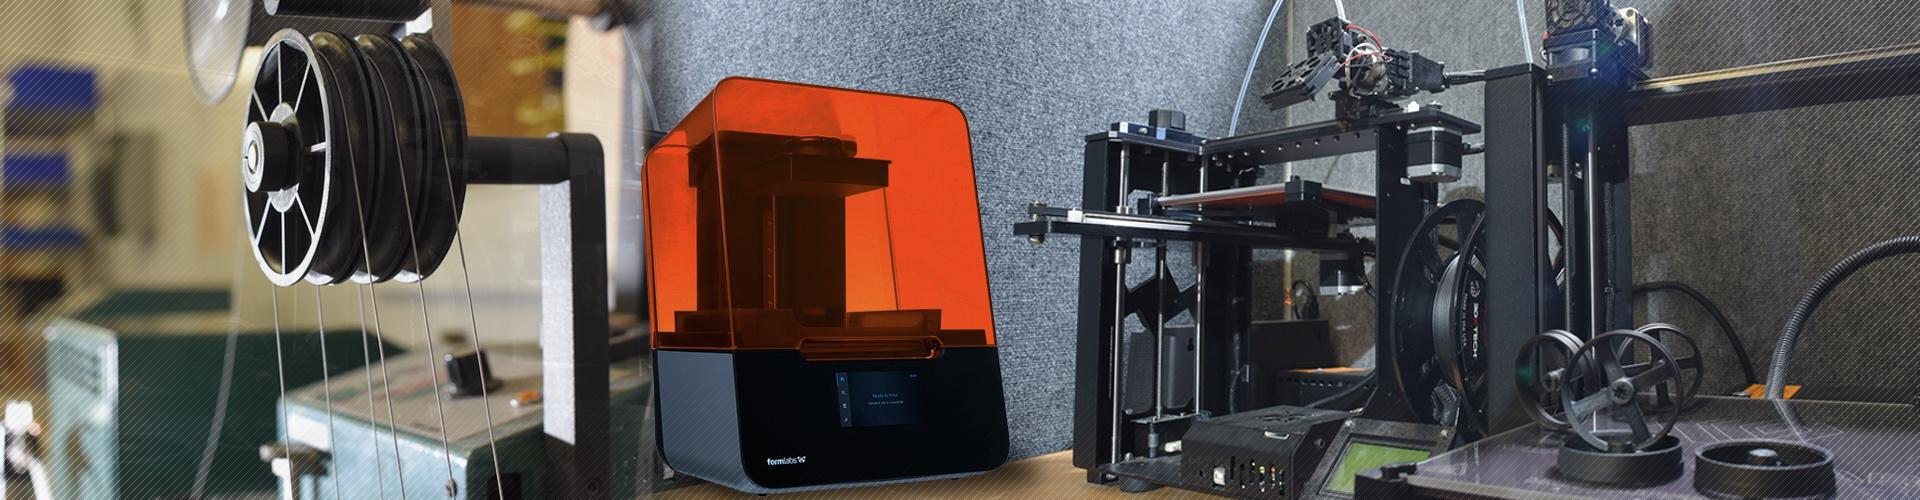 3D Printing & Prototyping